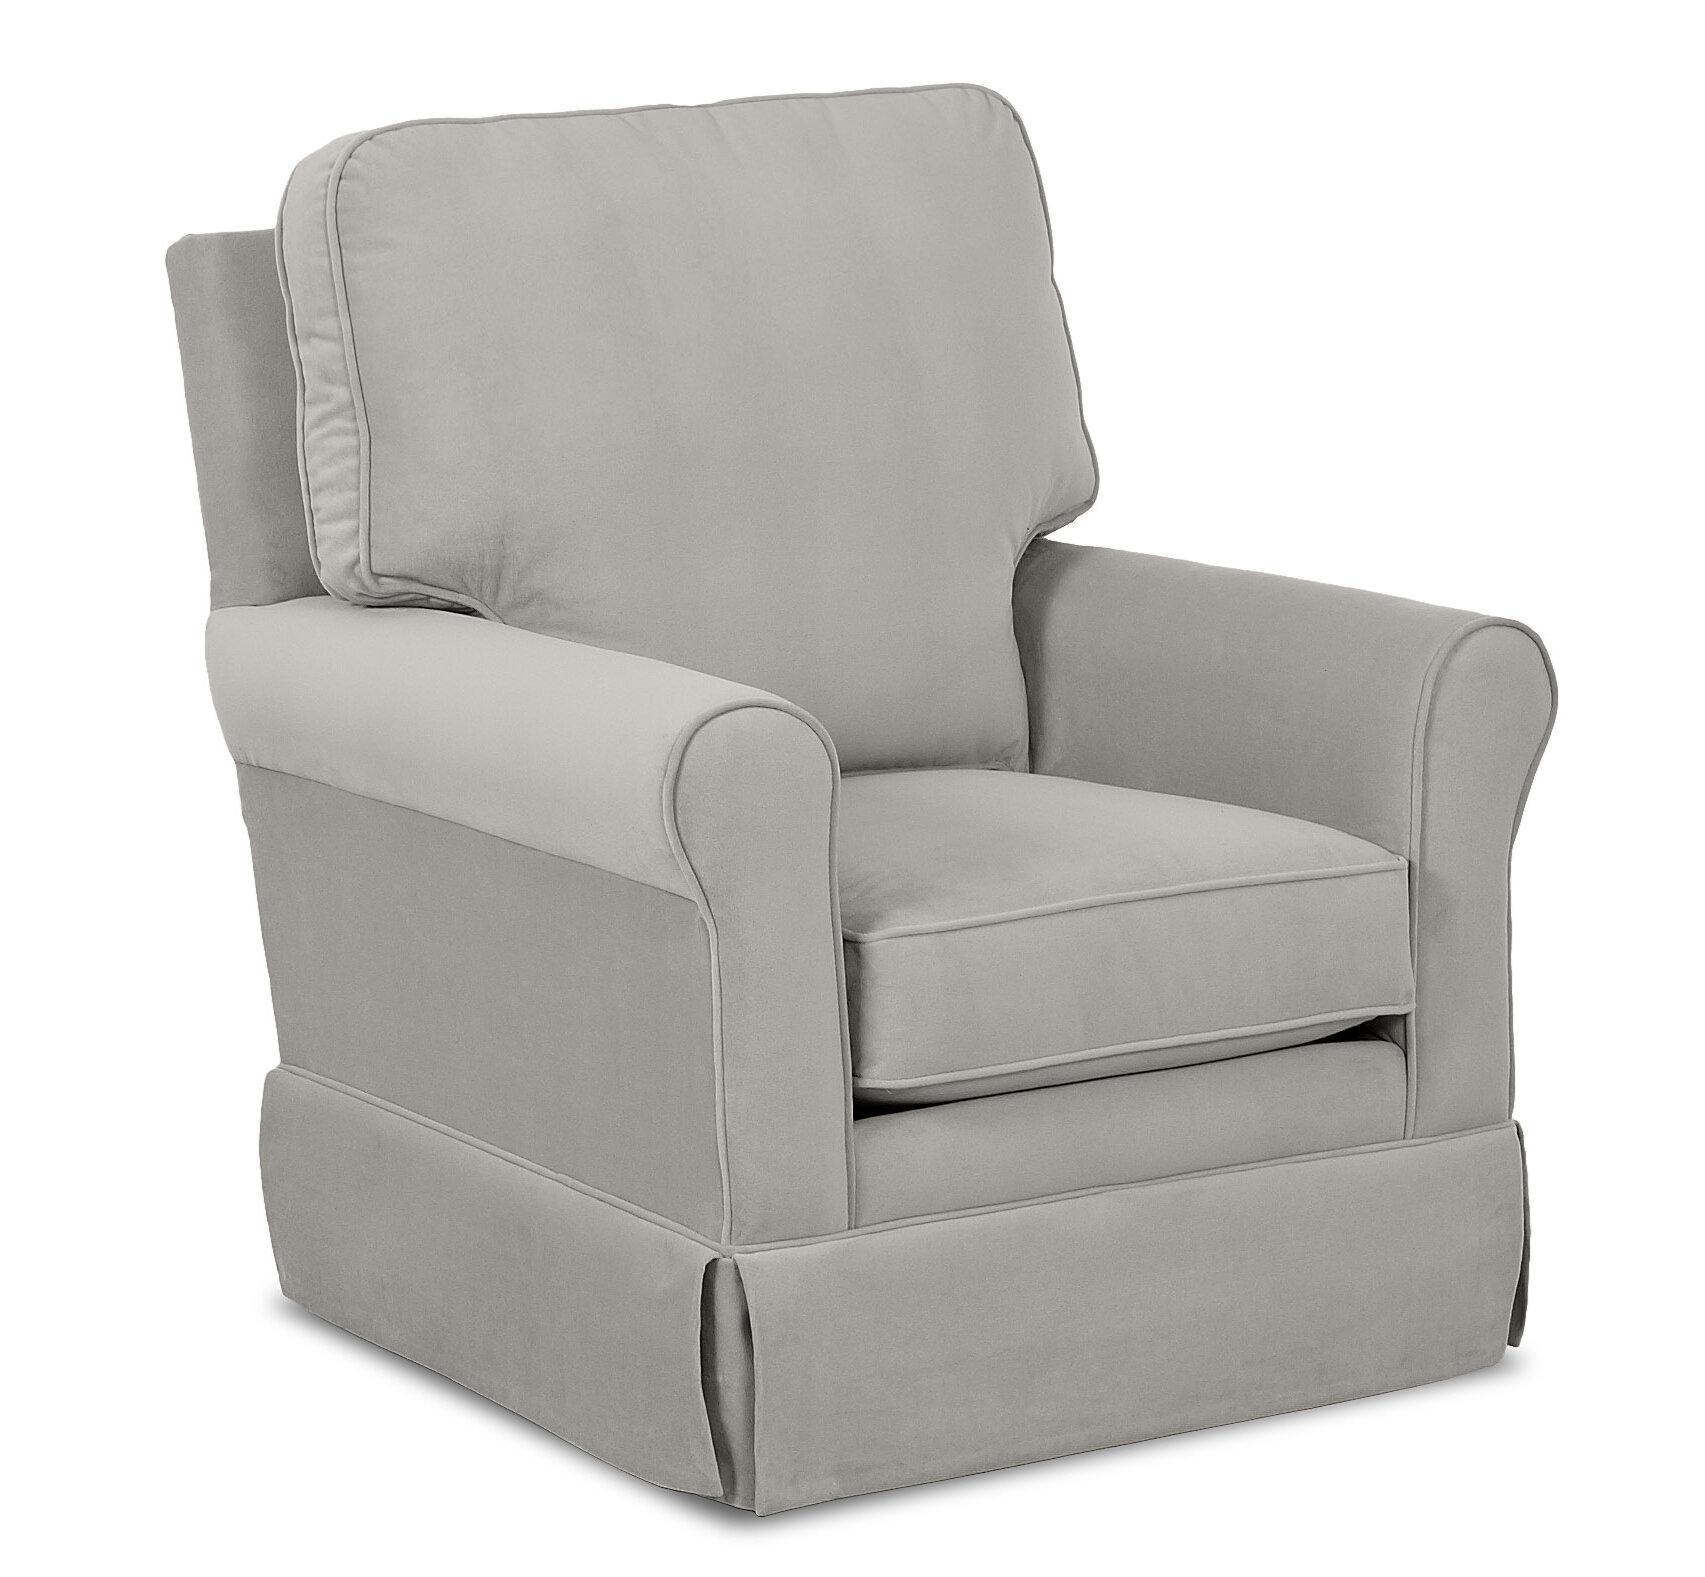 Miraculous Bridgeport Swivel Glider Lamtechconsult Wood Chair Design Ideas Lamtechconsultcom